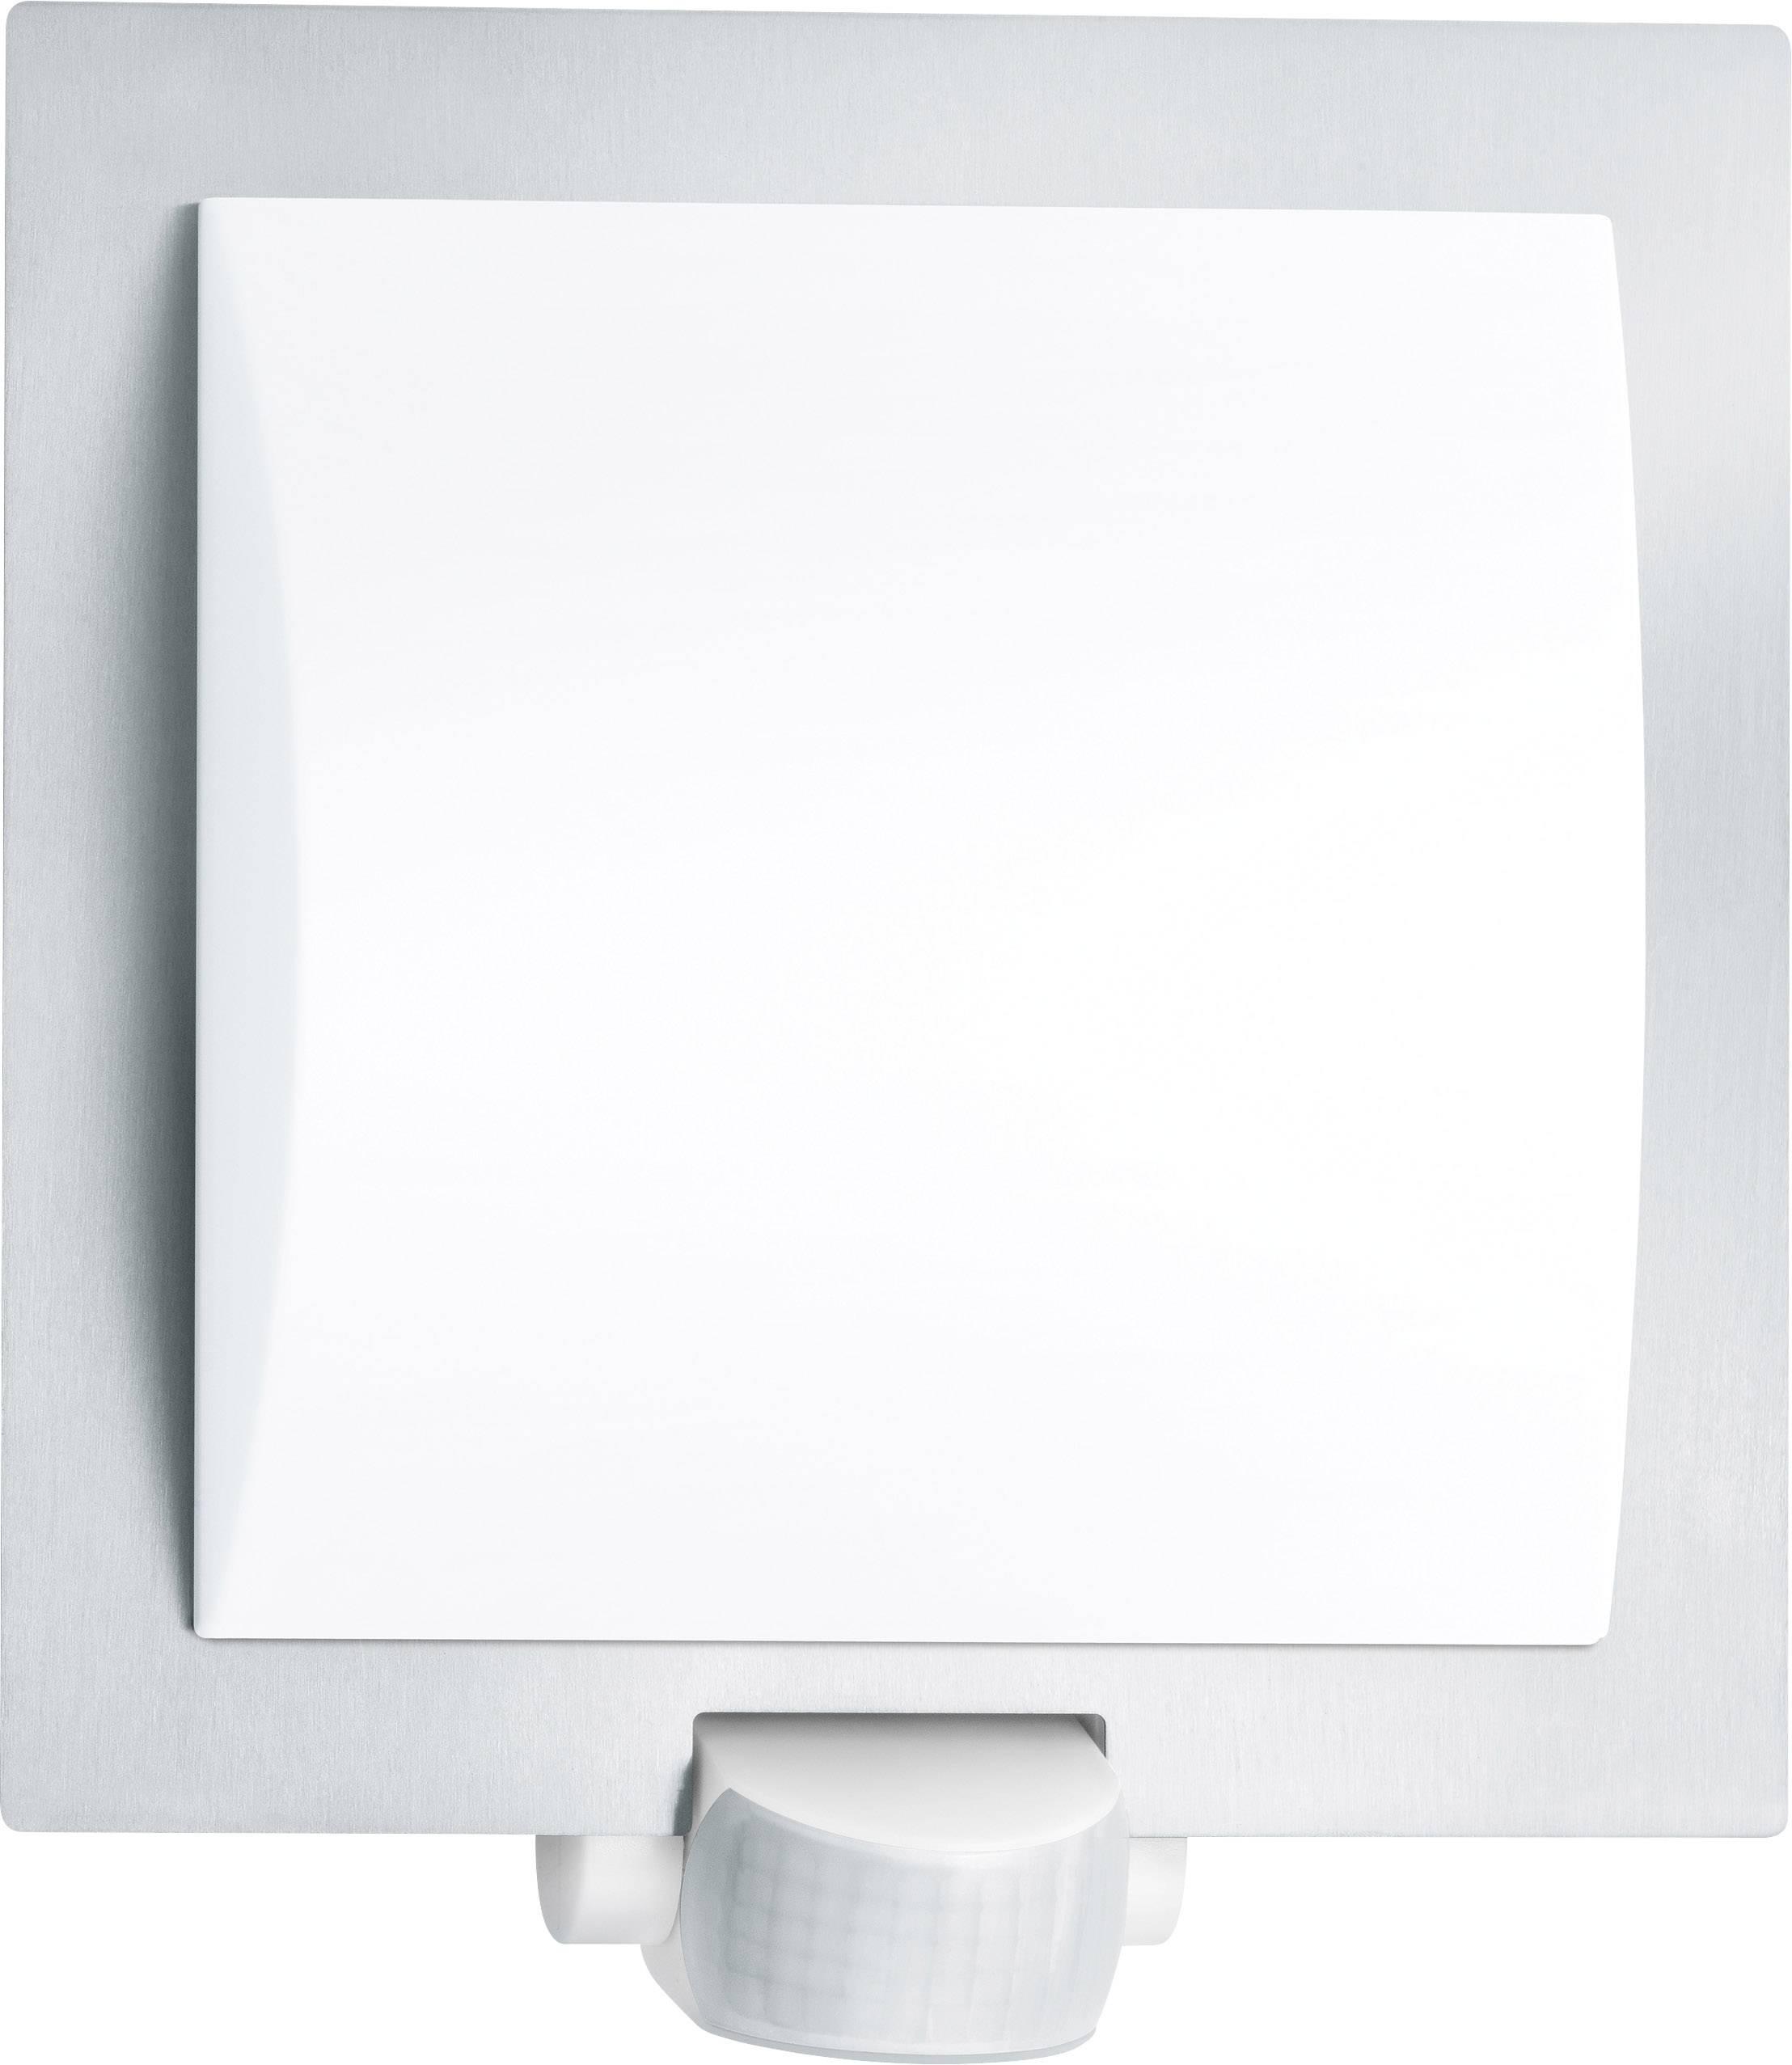 was bedeutet l20 bei lampen